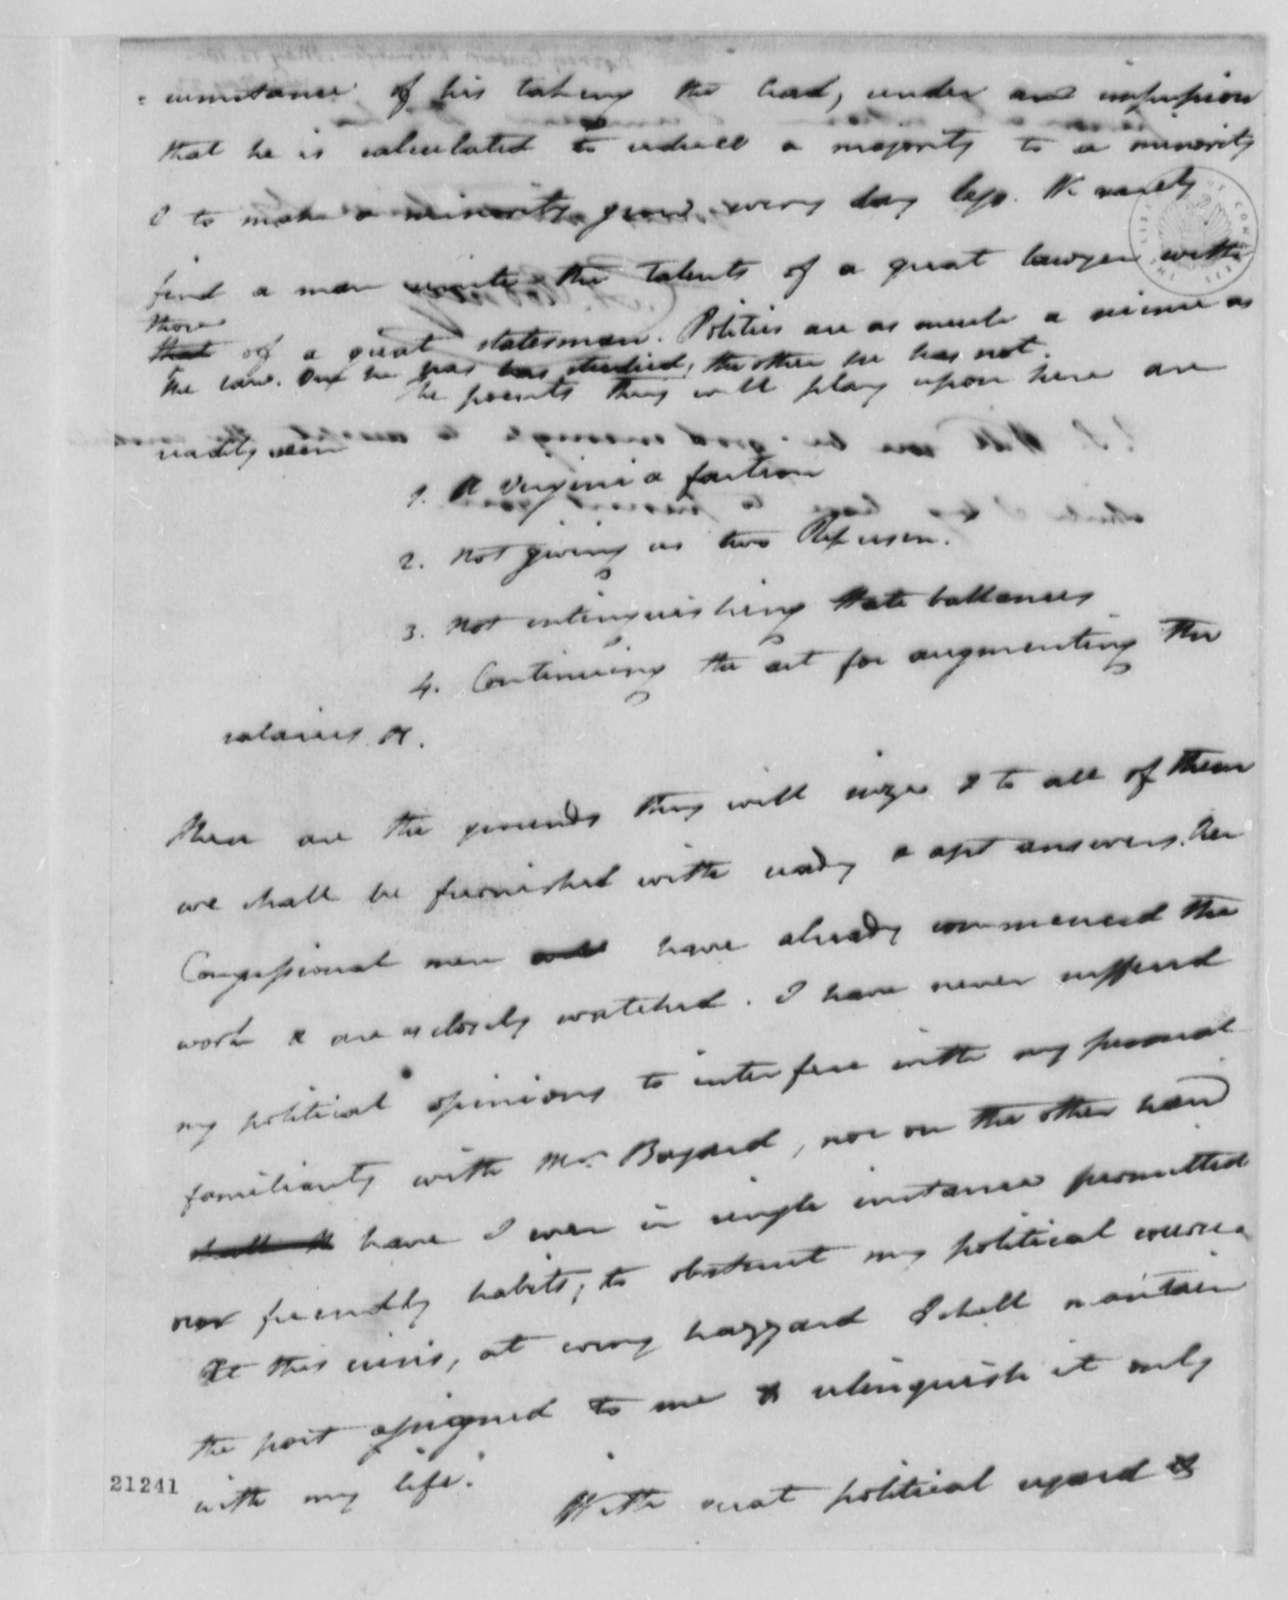 Caesar A. Rodney to Thomas Jefferson, May 16, 1802